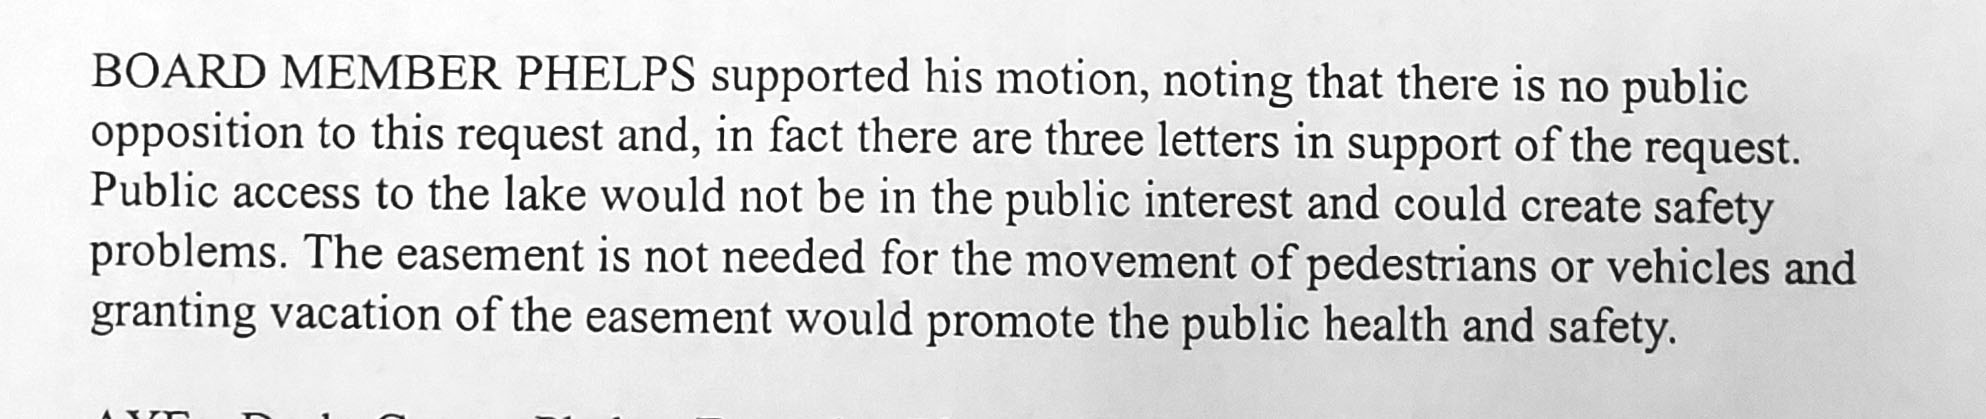 Municipal Platting Board meeting comment regarding von Imhof easement vacation